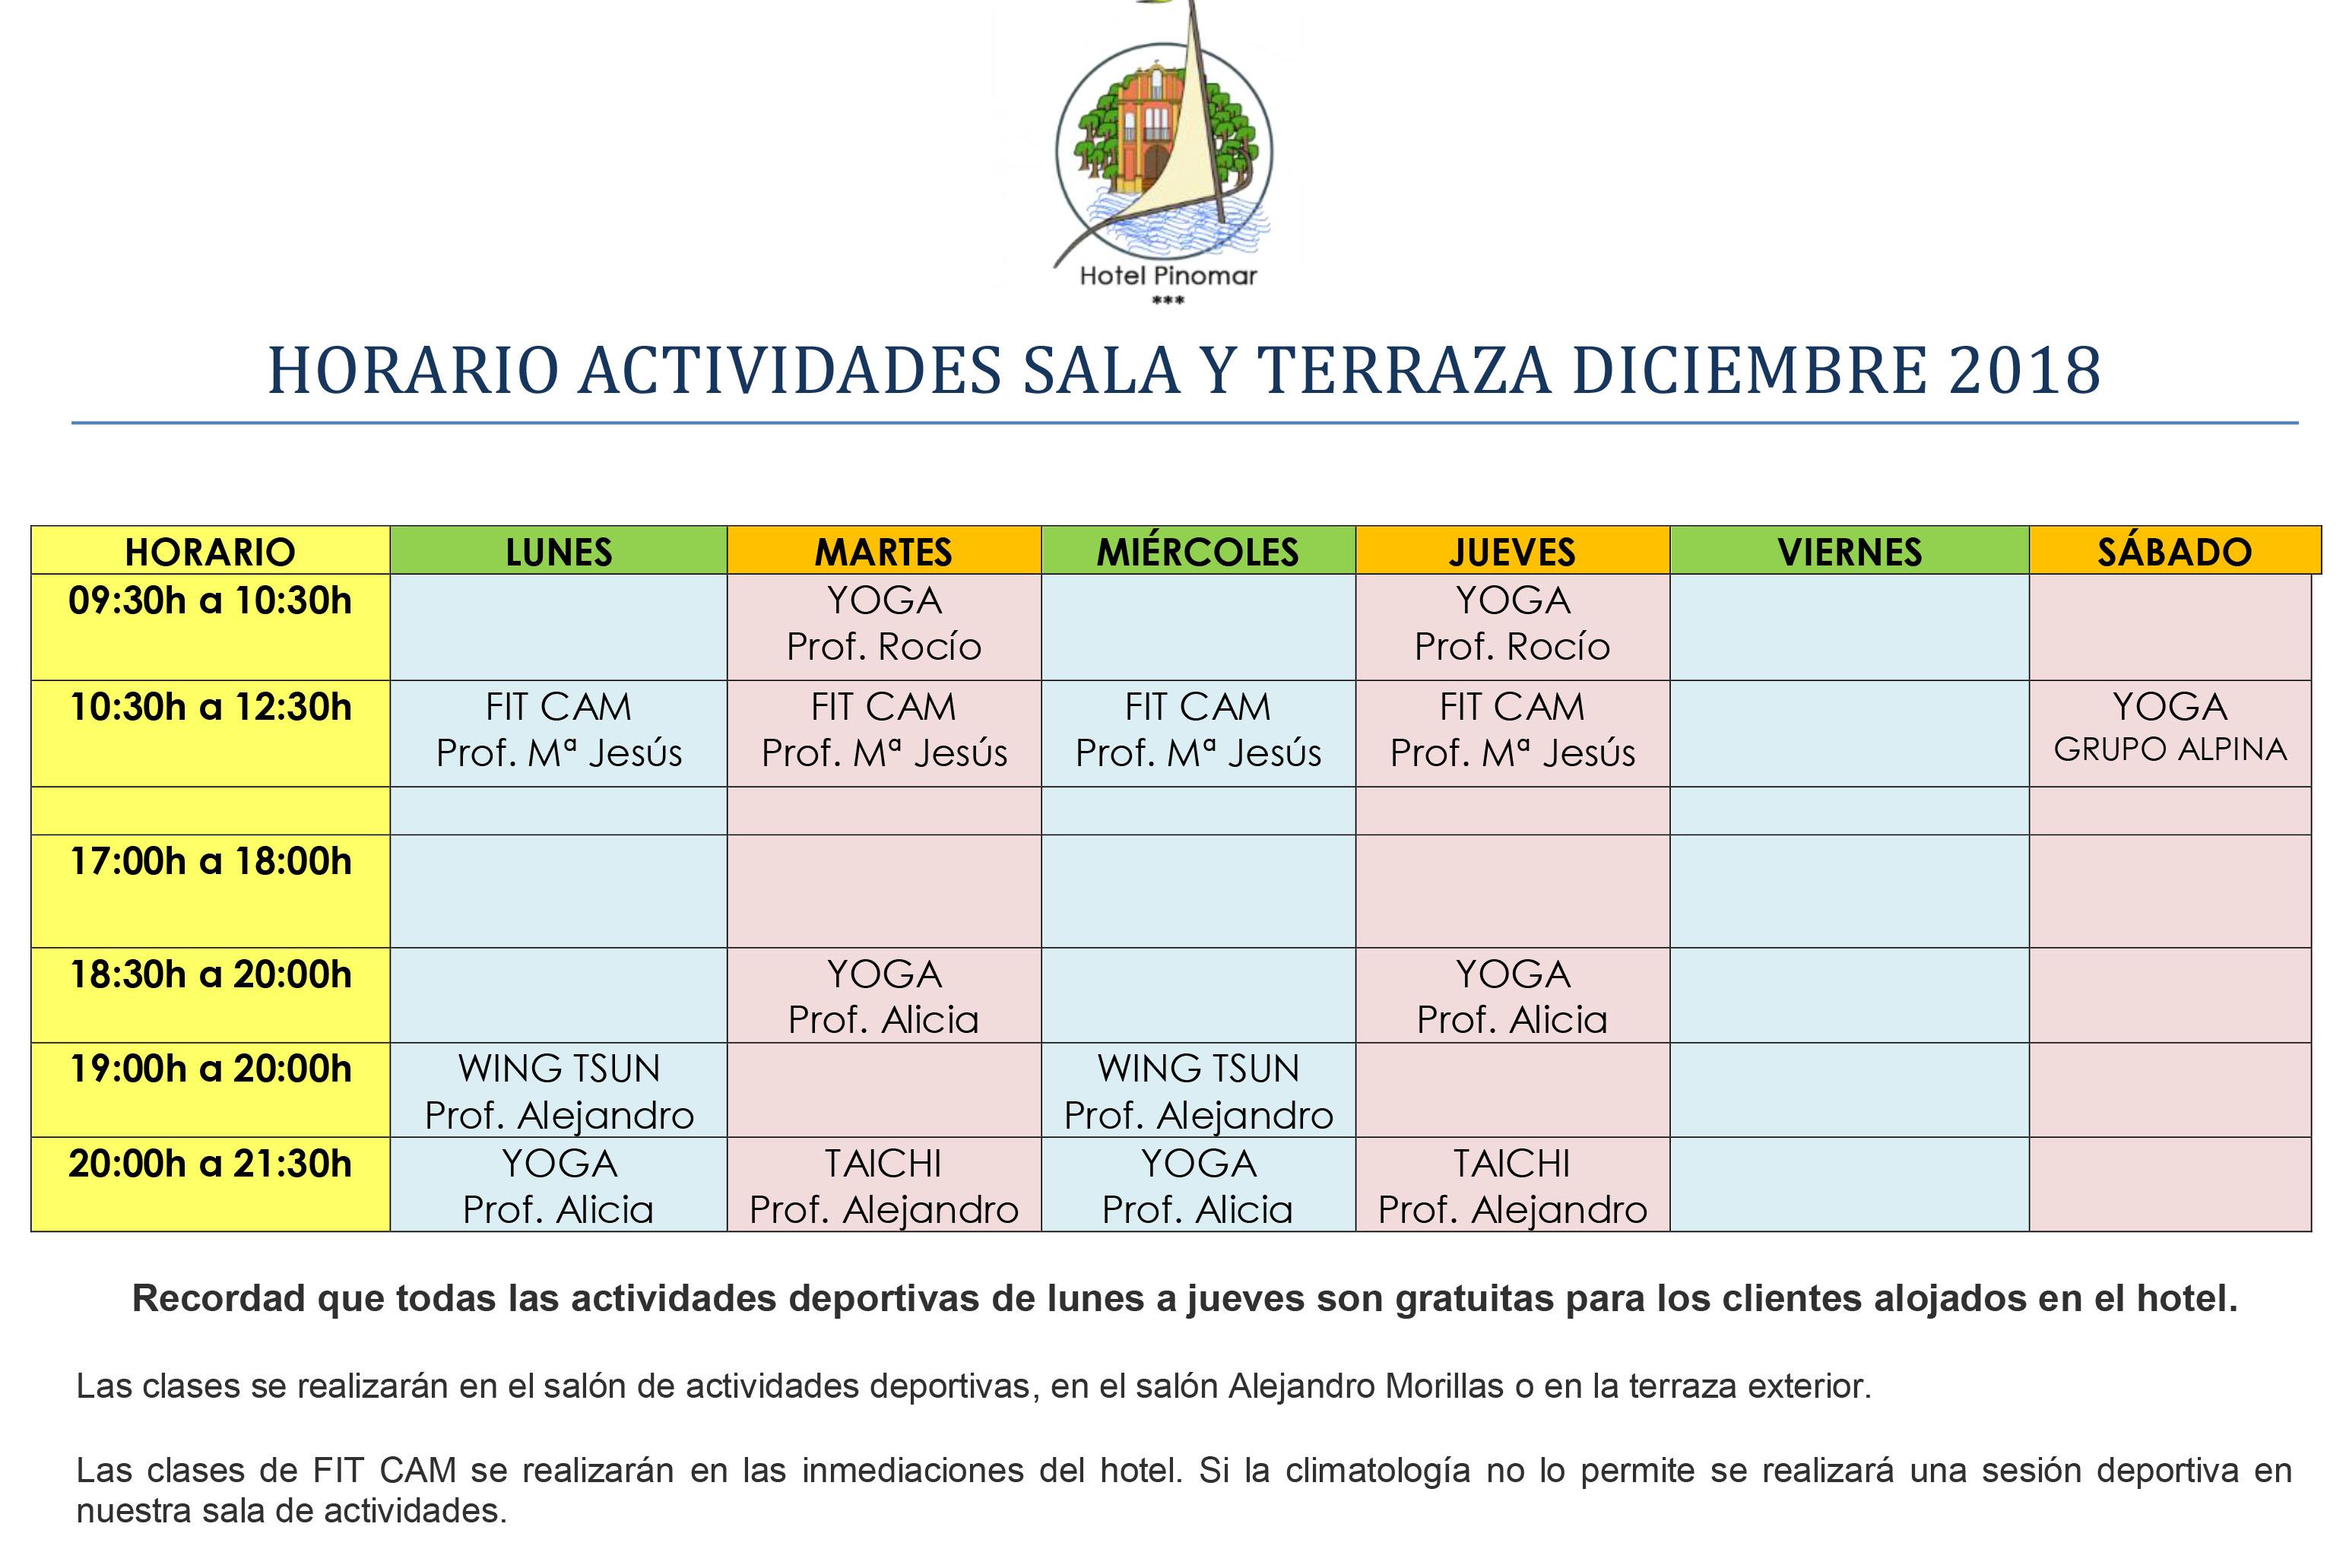 HORARIO ACTIVIDADES DIRIGIDAS DICIEMBRE 2018